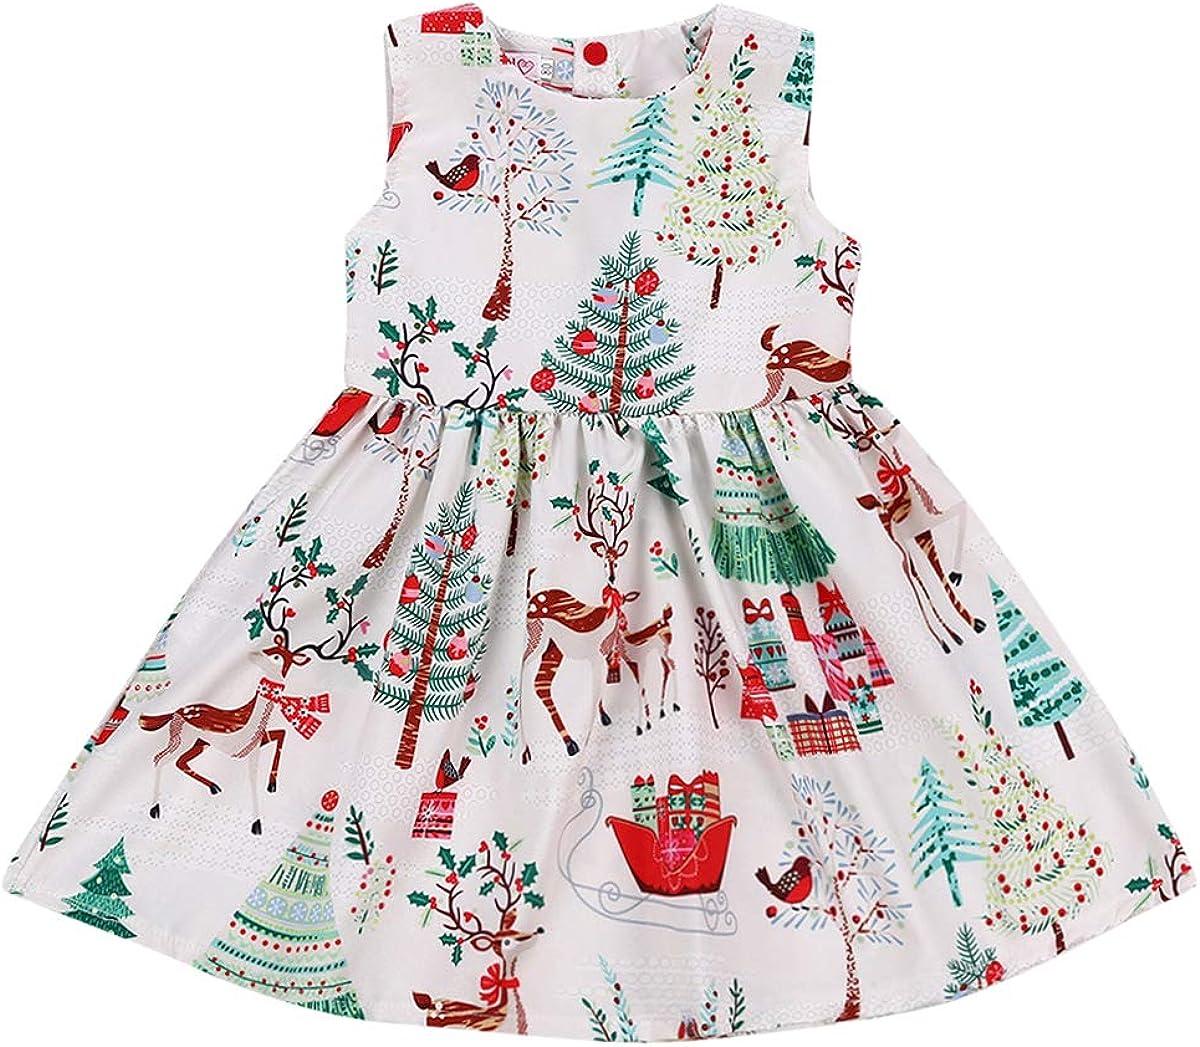 Wassery Toddler Baby Girls Christmas Sleeveless Dress Cartoon Deer Floral Print Clothes